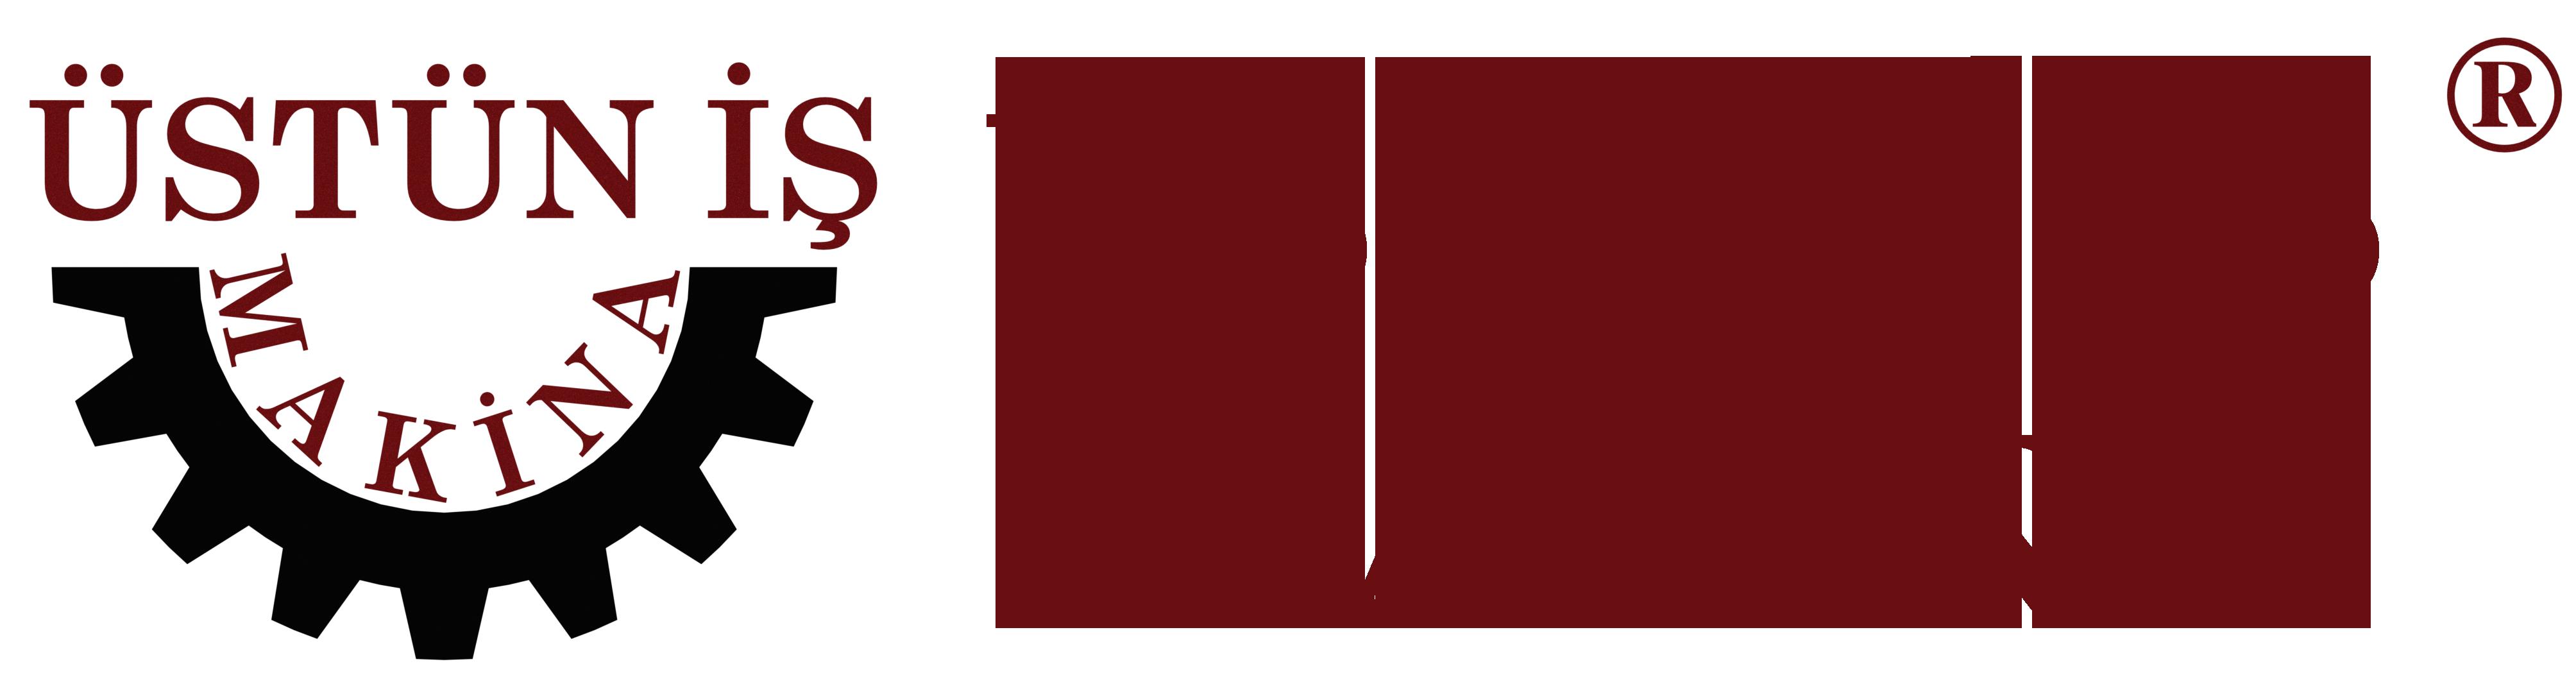 USTUNIS MAKINA